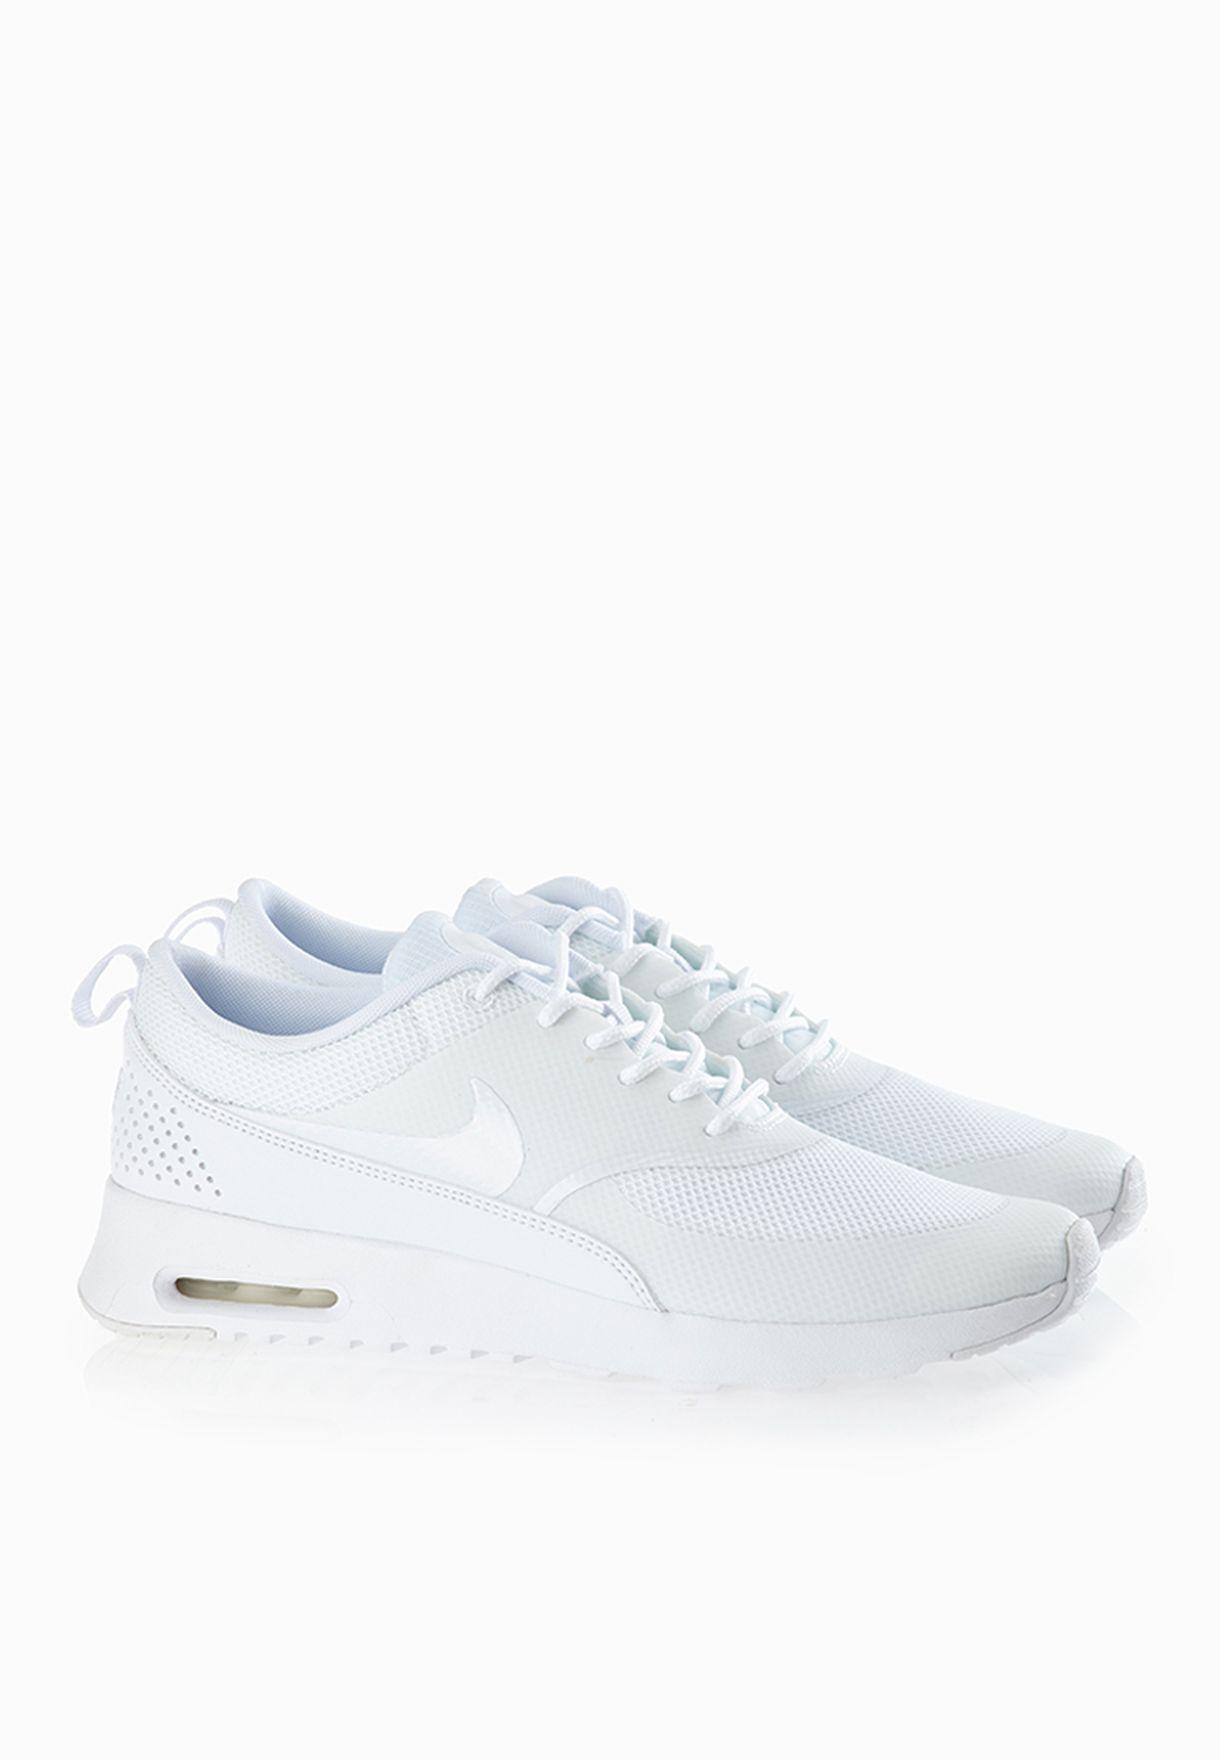 e194e598 Shop Nike white Air Max Thea Sneakers 599409-101 for Women in ...